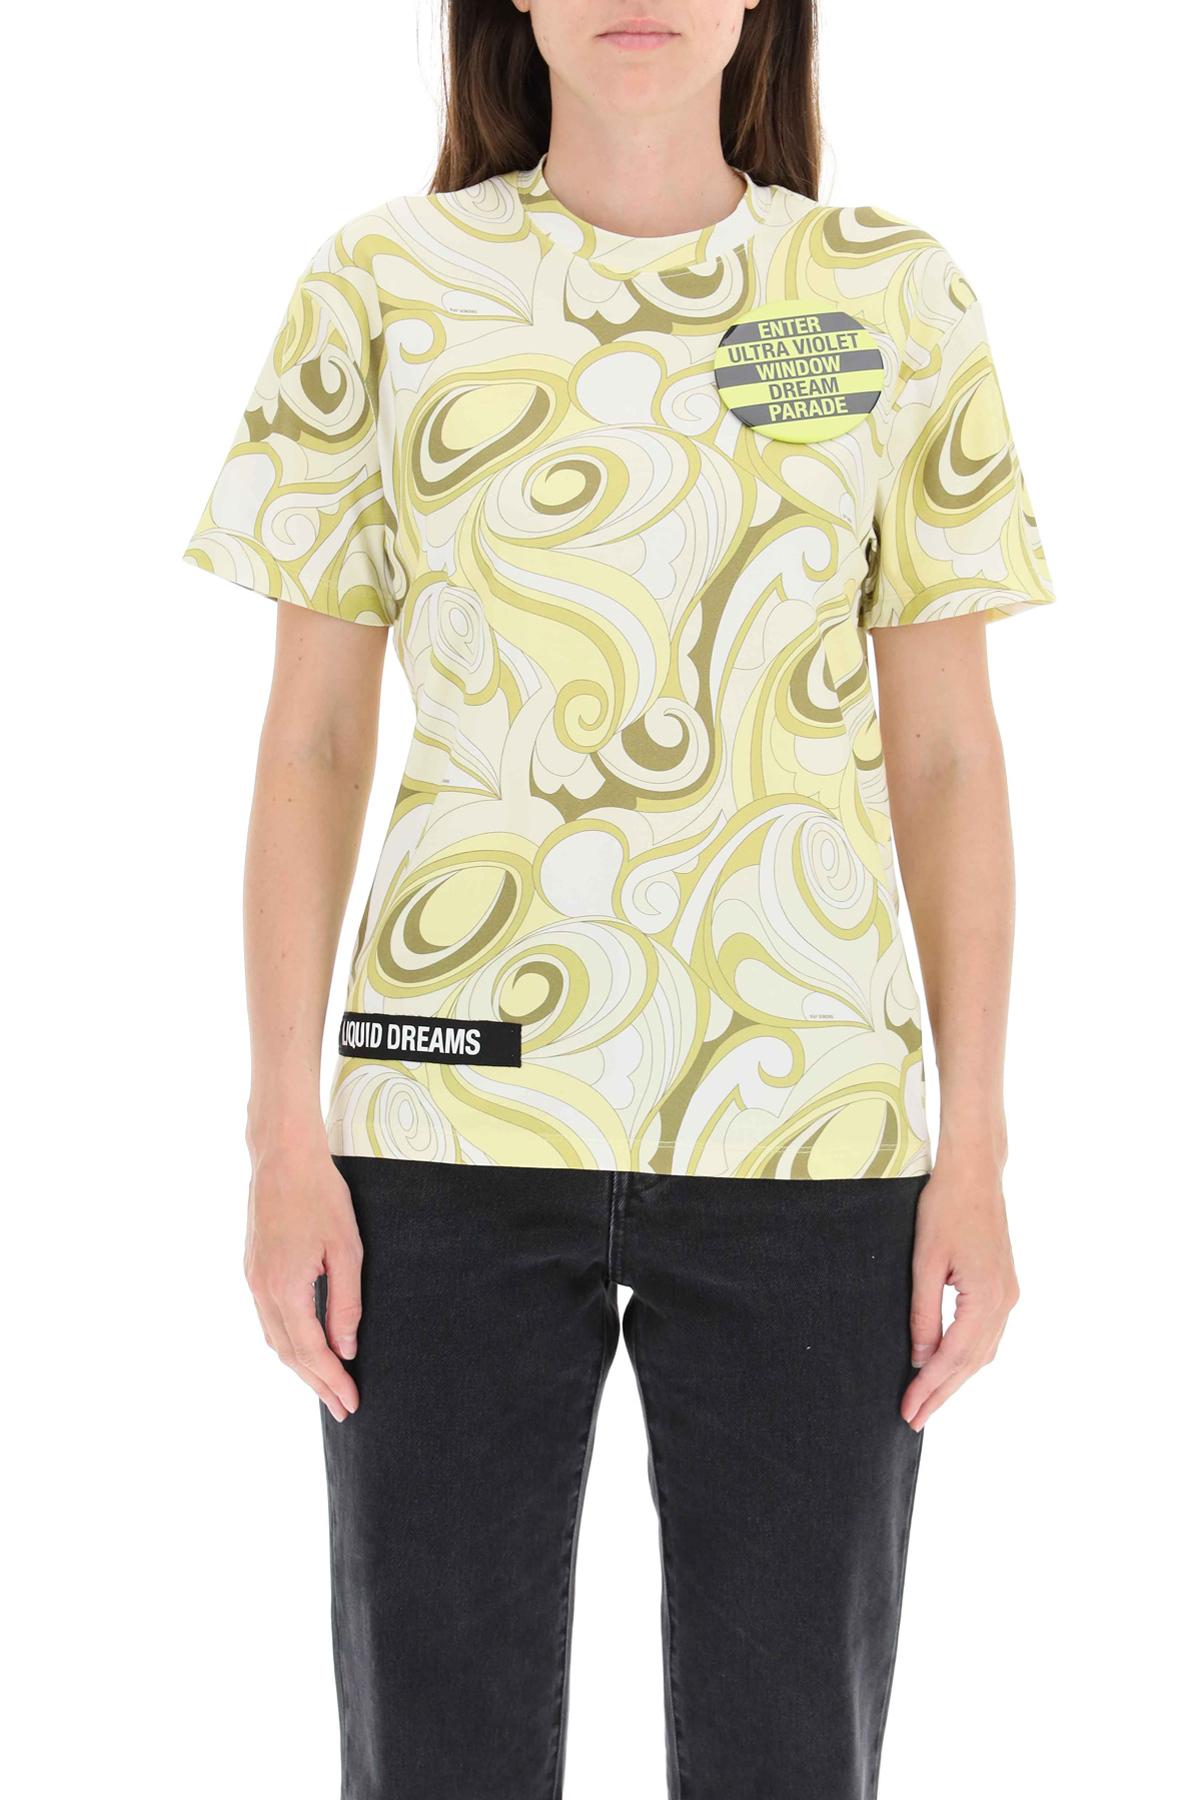 Raf simons t-shirt stampata con spilla